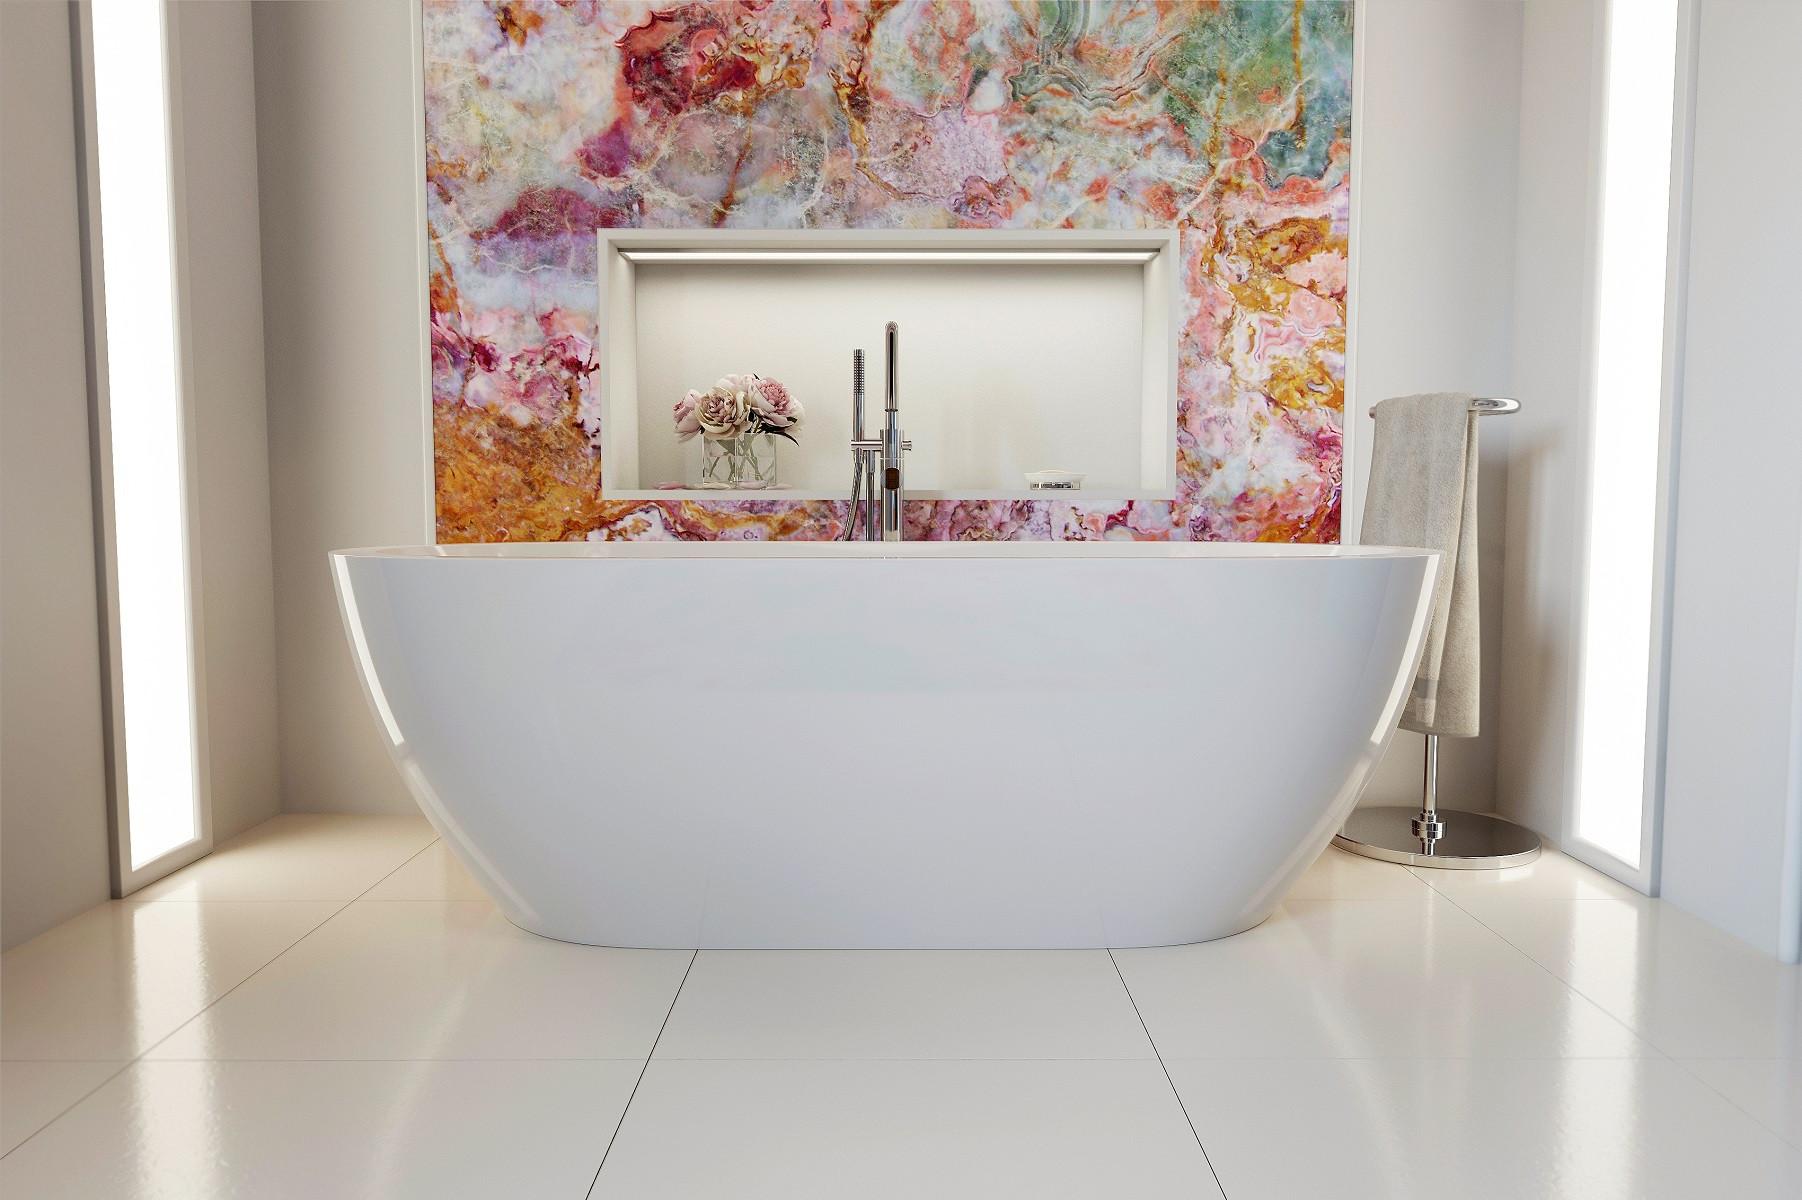 Aquatica PS014E Gloria-Wht Free Standing Acrylic Bathroom Bathtub In White